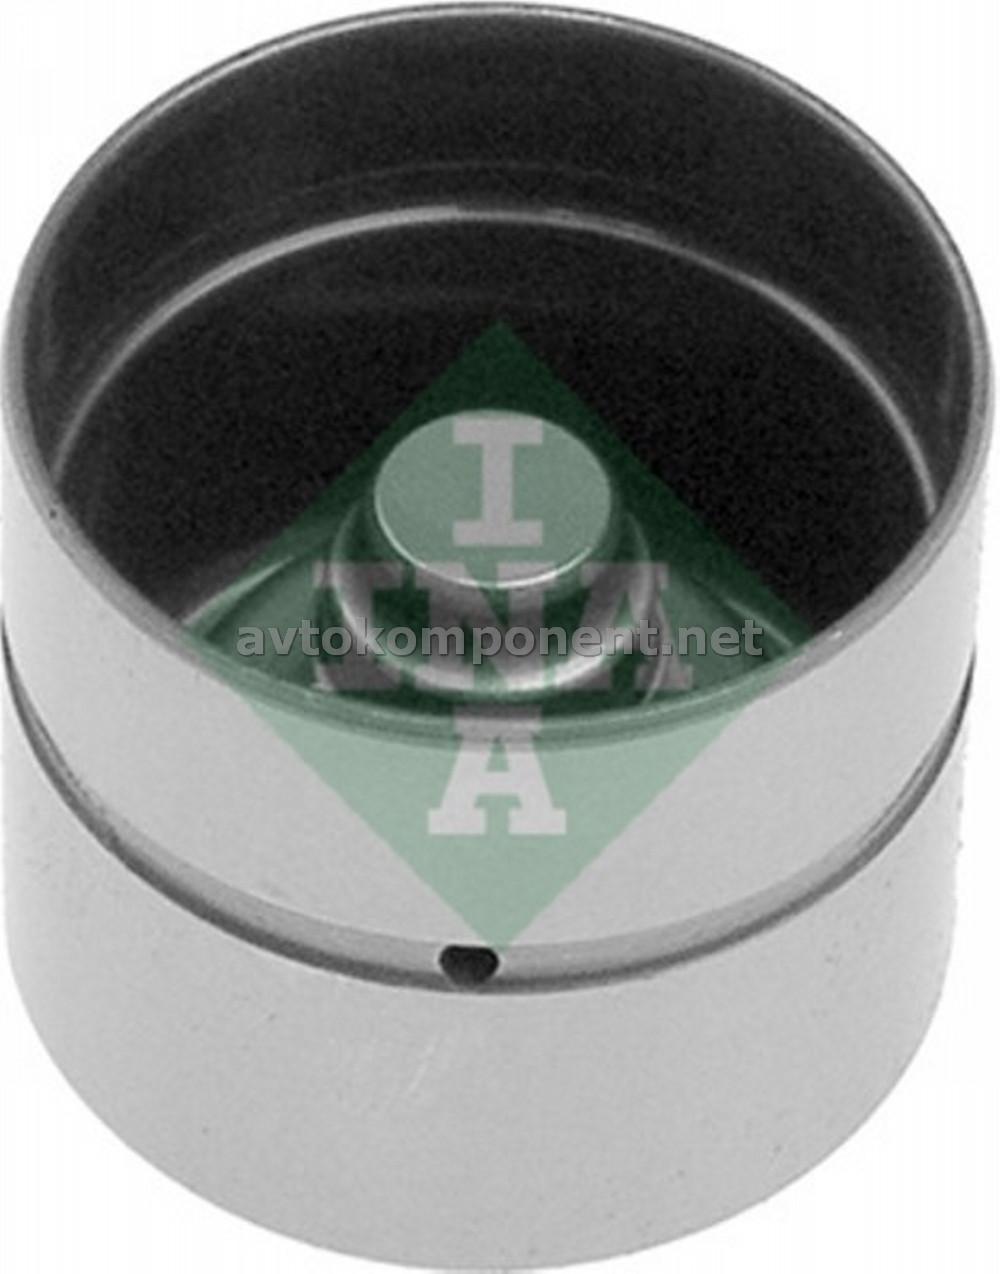 Гидротолкатель DAEWOO/CHEVROLET/OPEL Lanos/Aveo 1.6 16V/2.0 16V (производство Ina) (арт. 420 0118 10), AAHZX